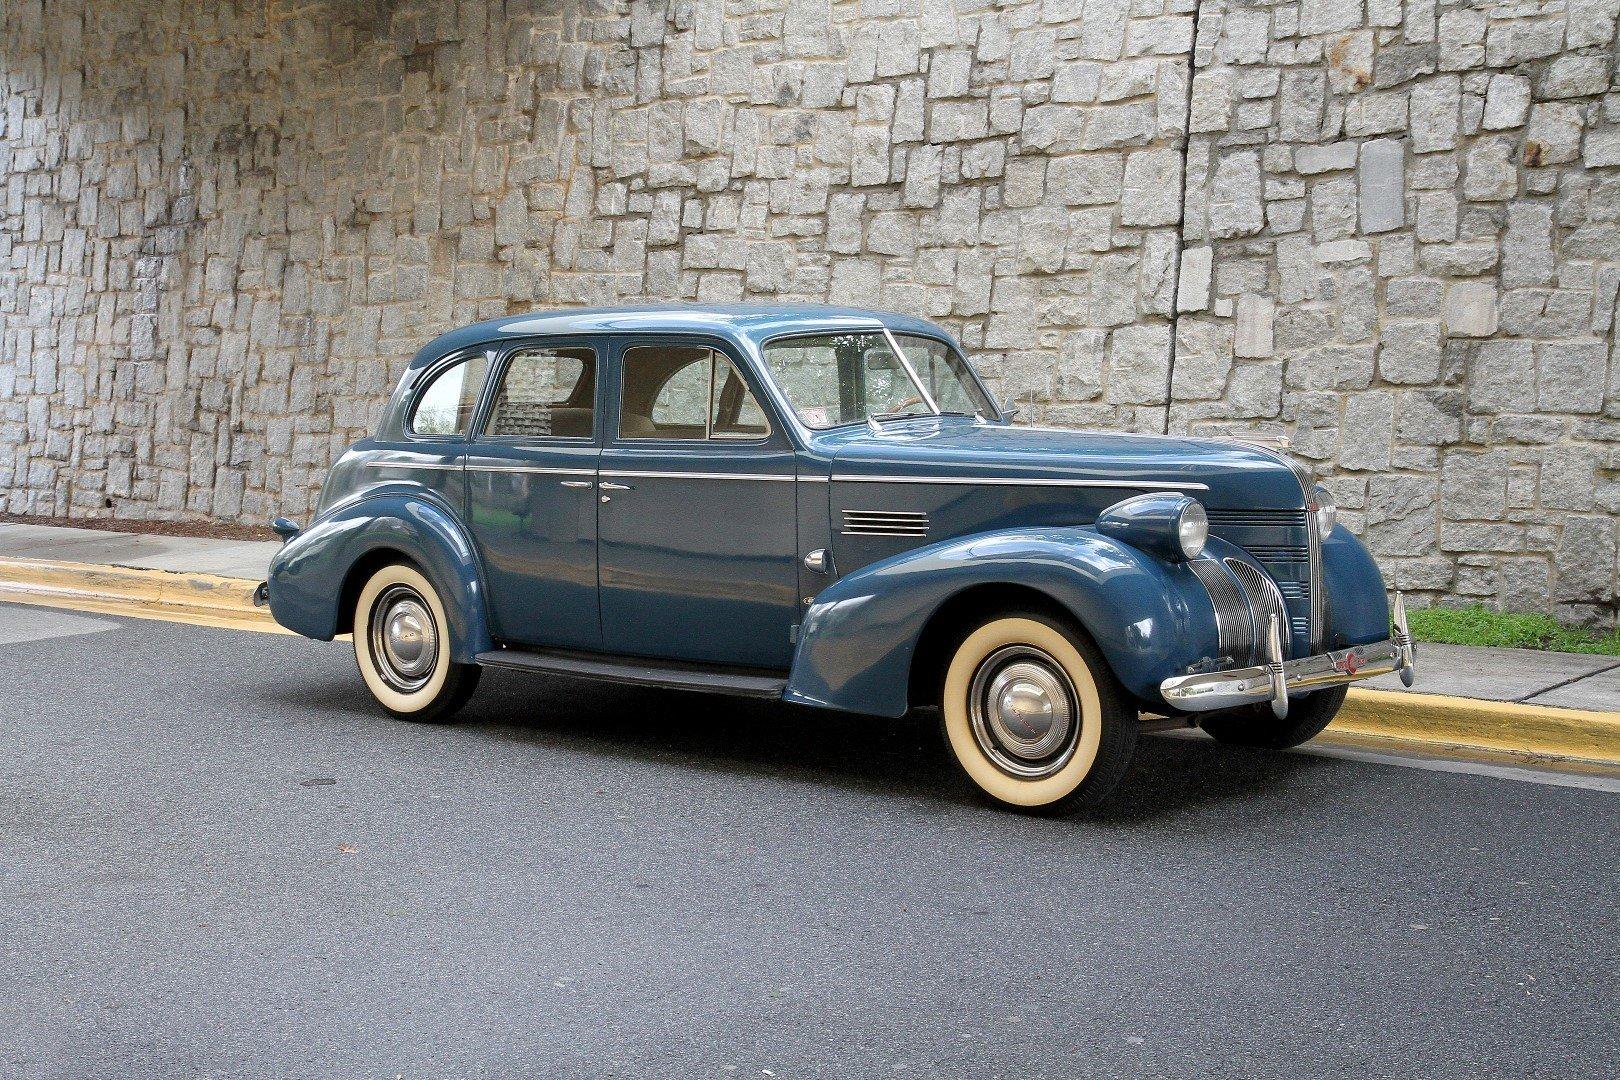 1939 pontiac deluxe eight touring sedan